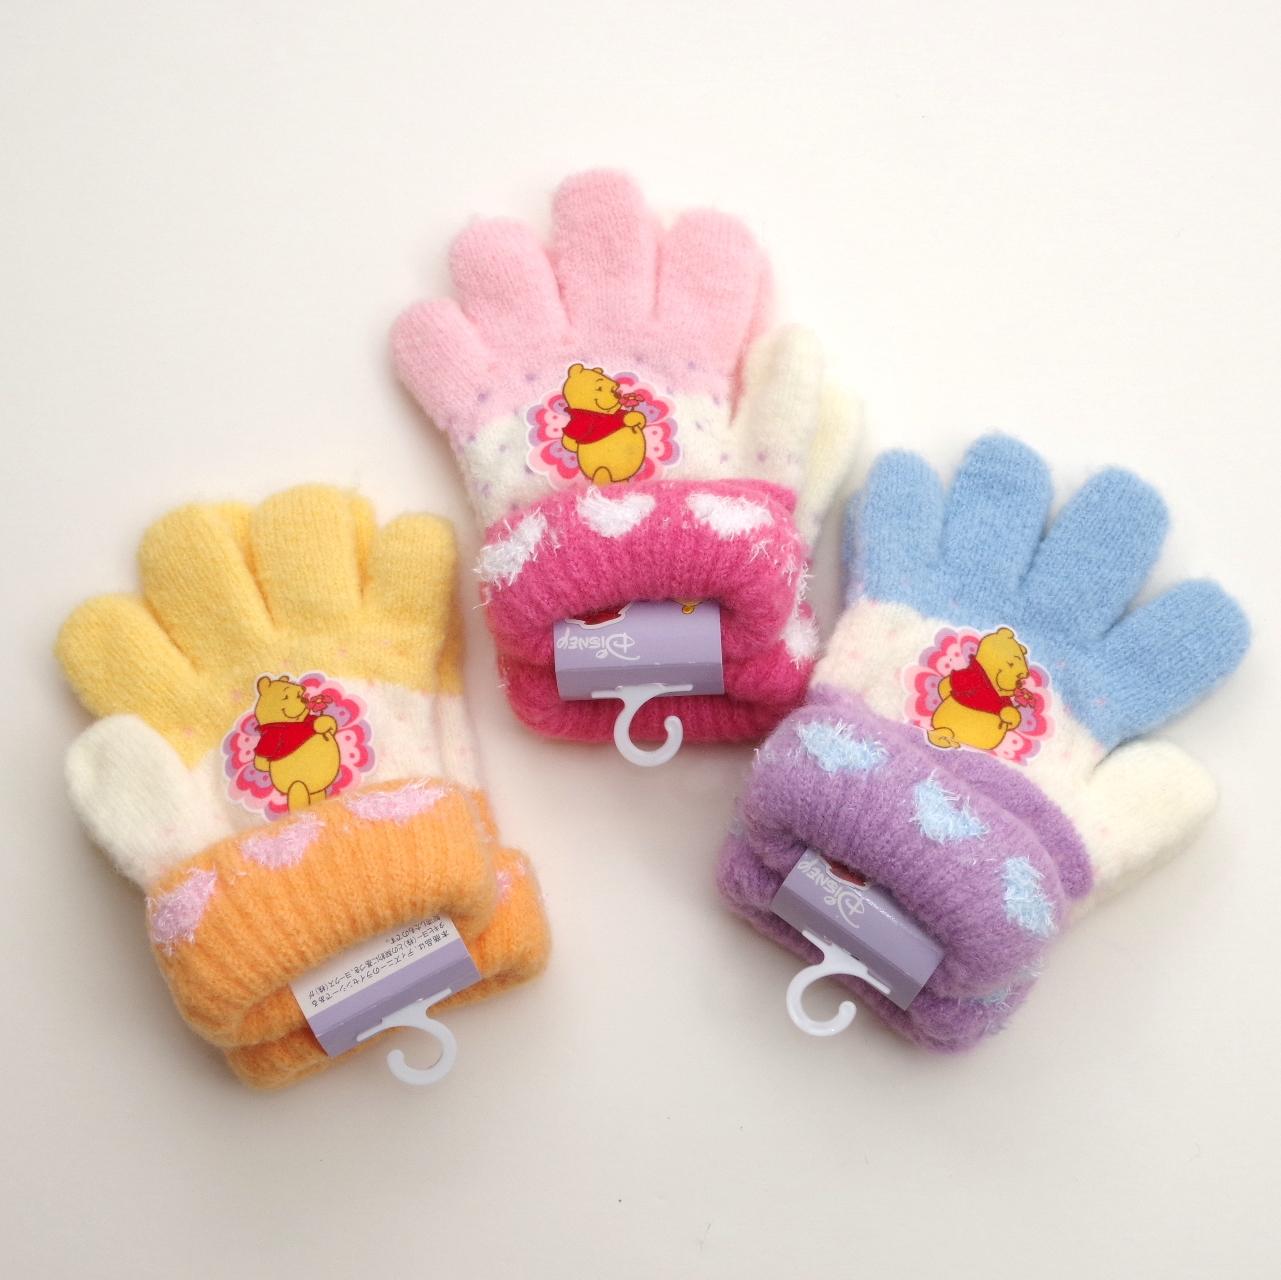 Disney(ディズニー)プーさん手袋 のびのび五指タイプ 15cm  (1610-1695)